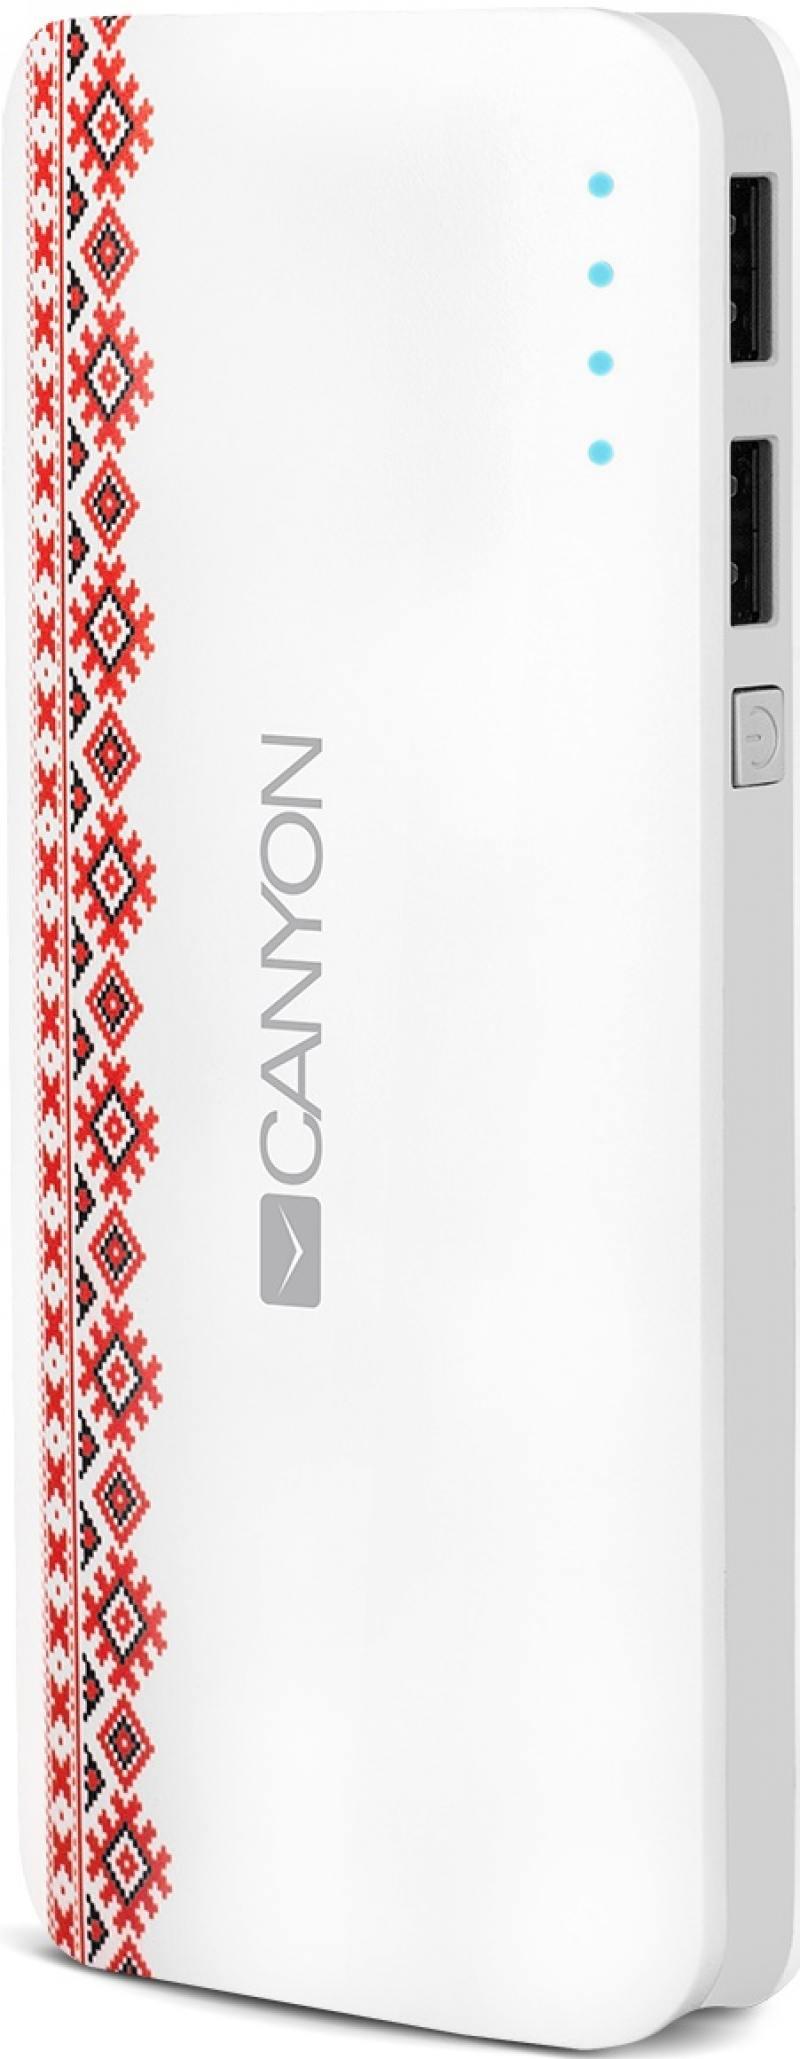 Портативное зарядное устройство Canyon CNE-CPB130V 13000мАч белый портативное зарядное устройство canyon cne cpb100 10000 мач белый